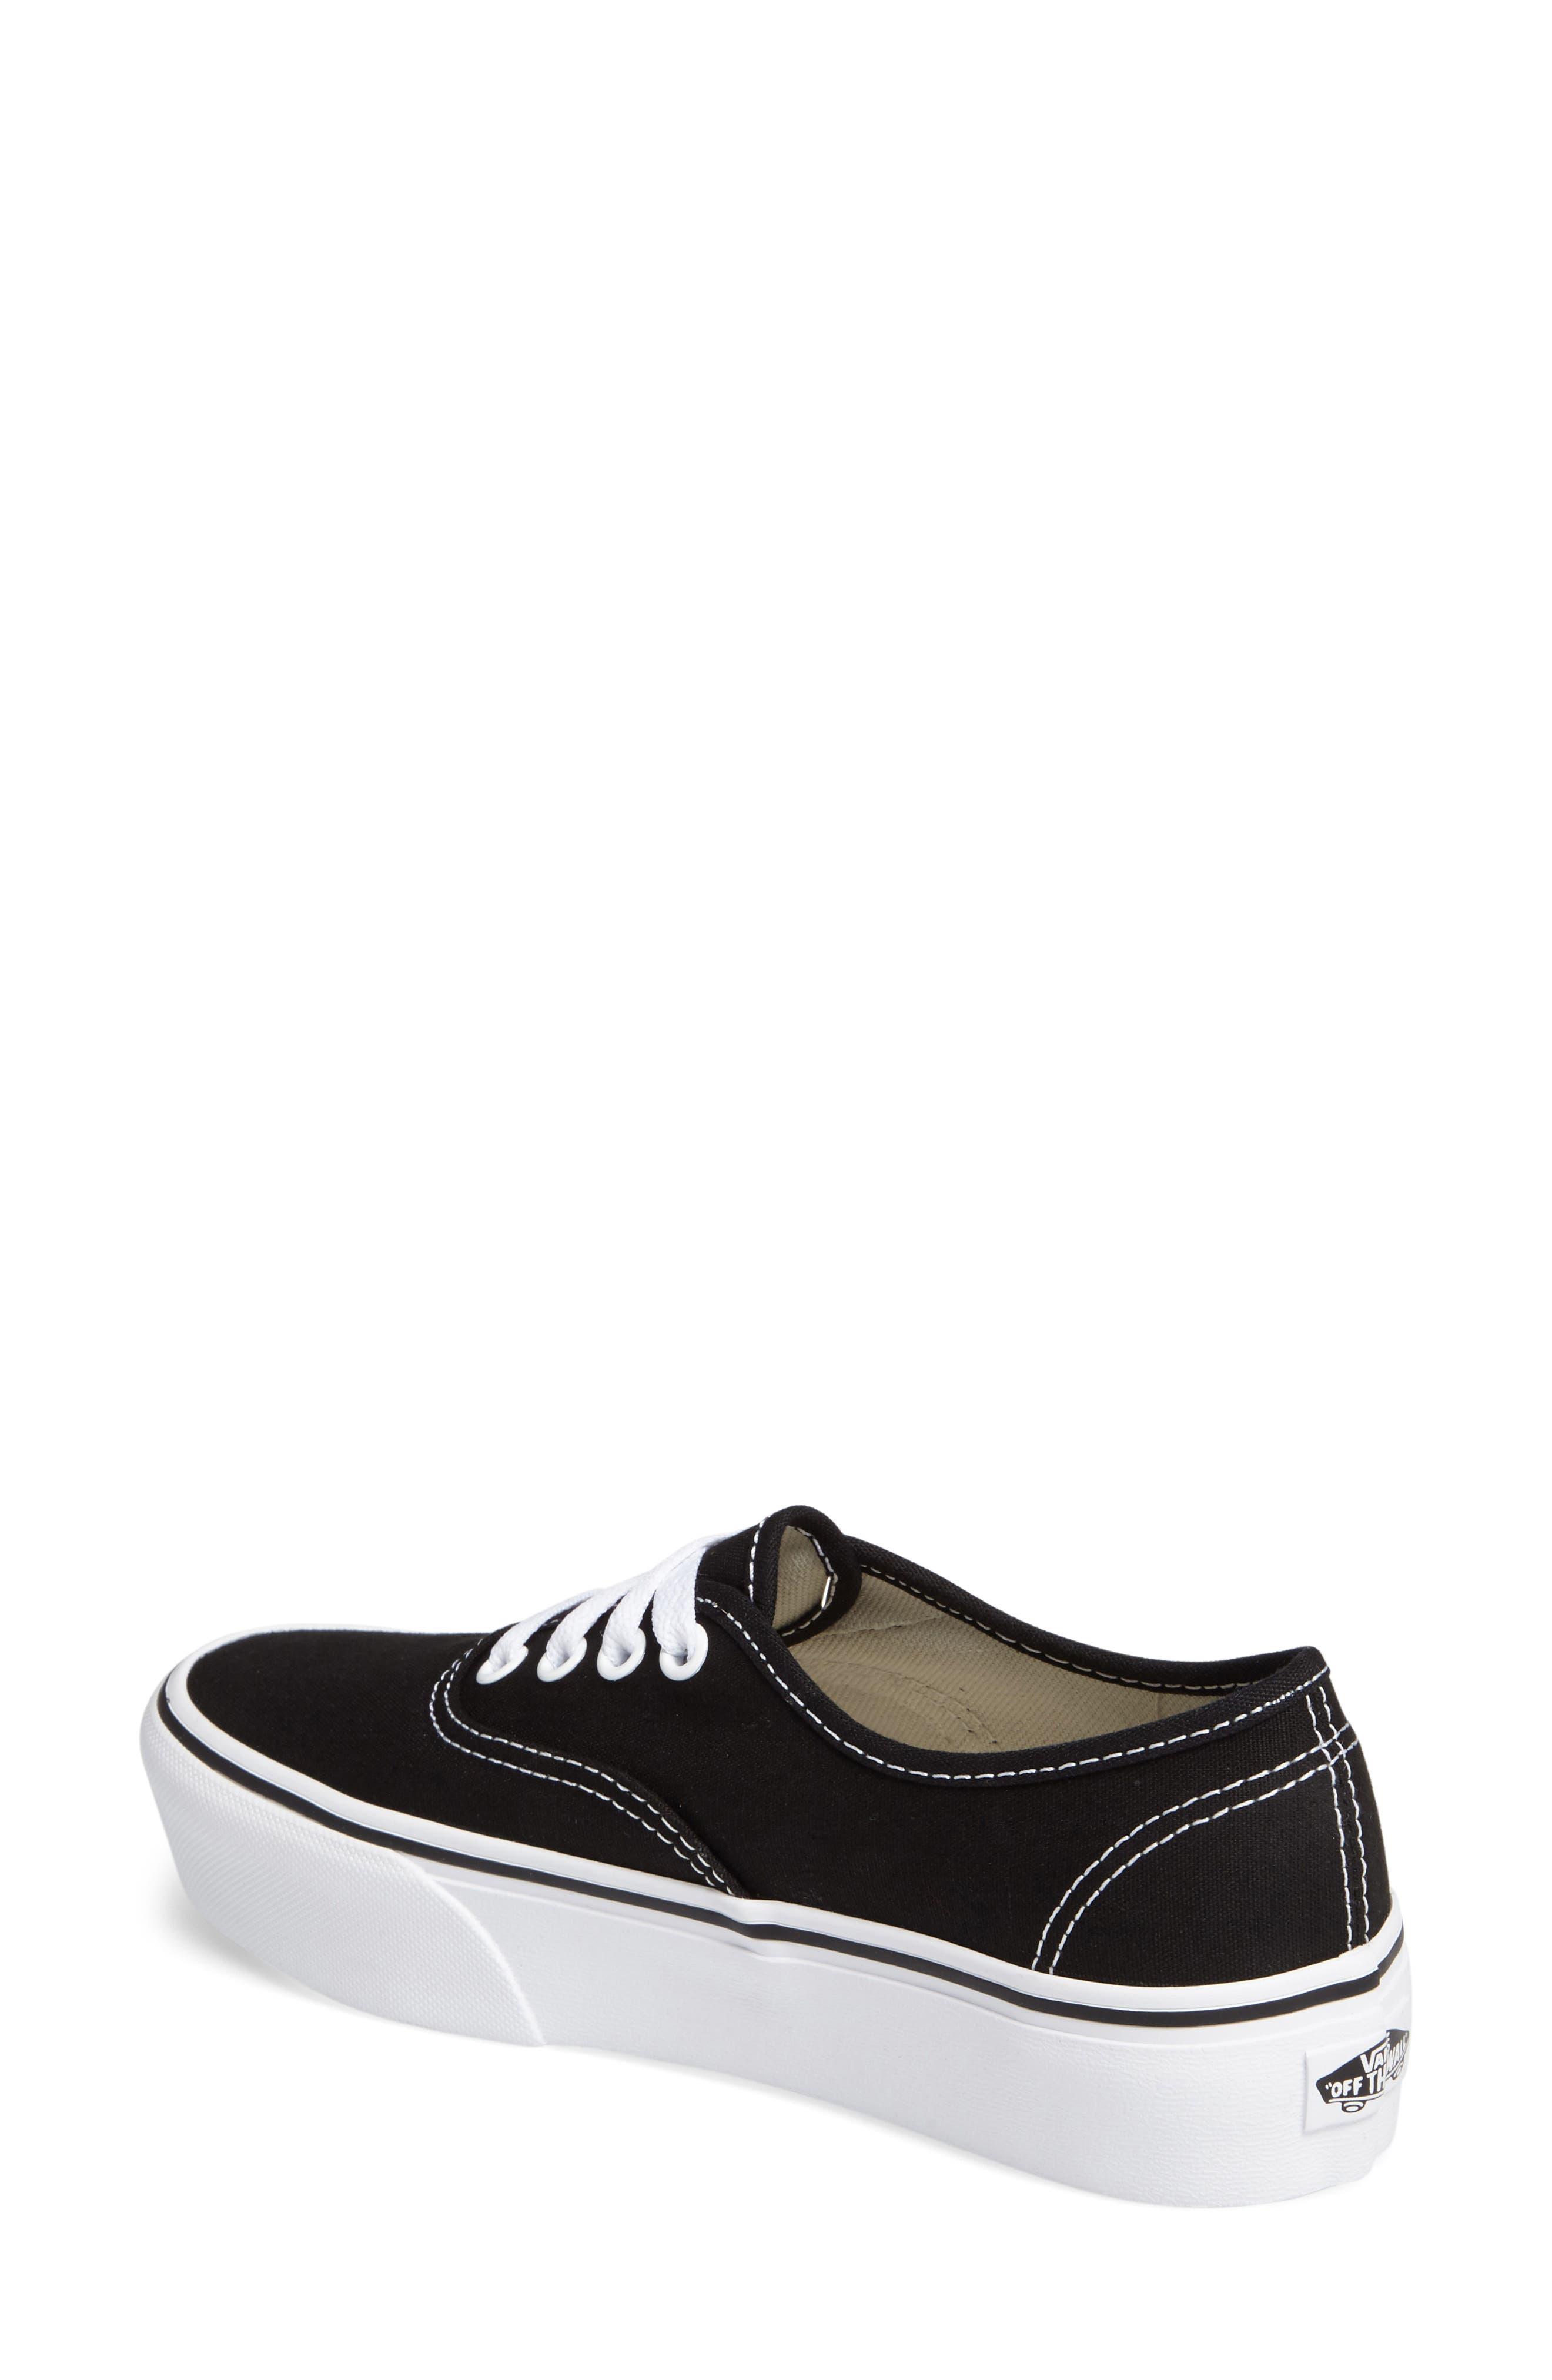 VANS, 'Authentic' Platform Sneaker, Alternate thumbnail 2, color, BLACK/ WHITE